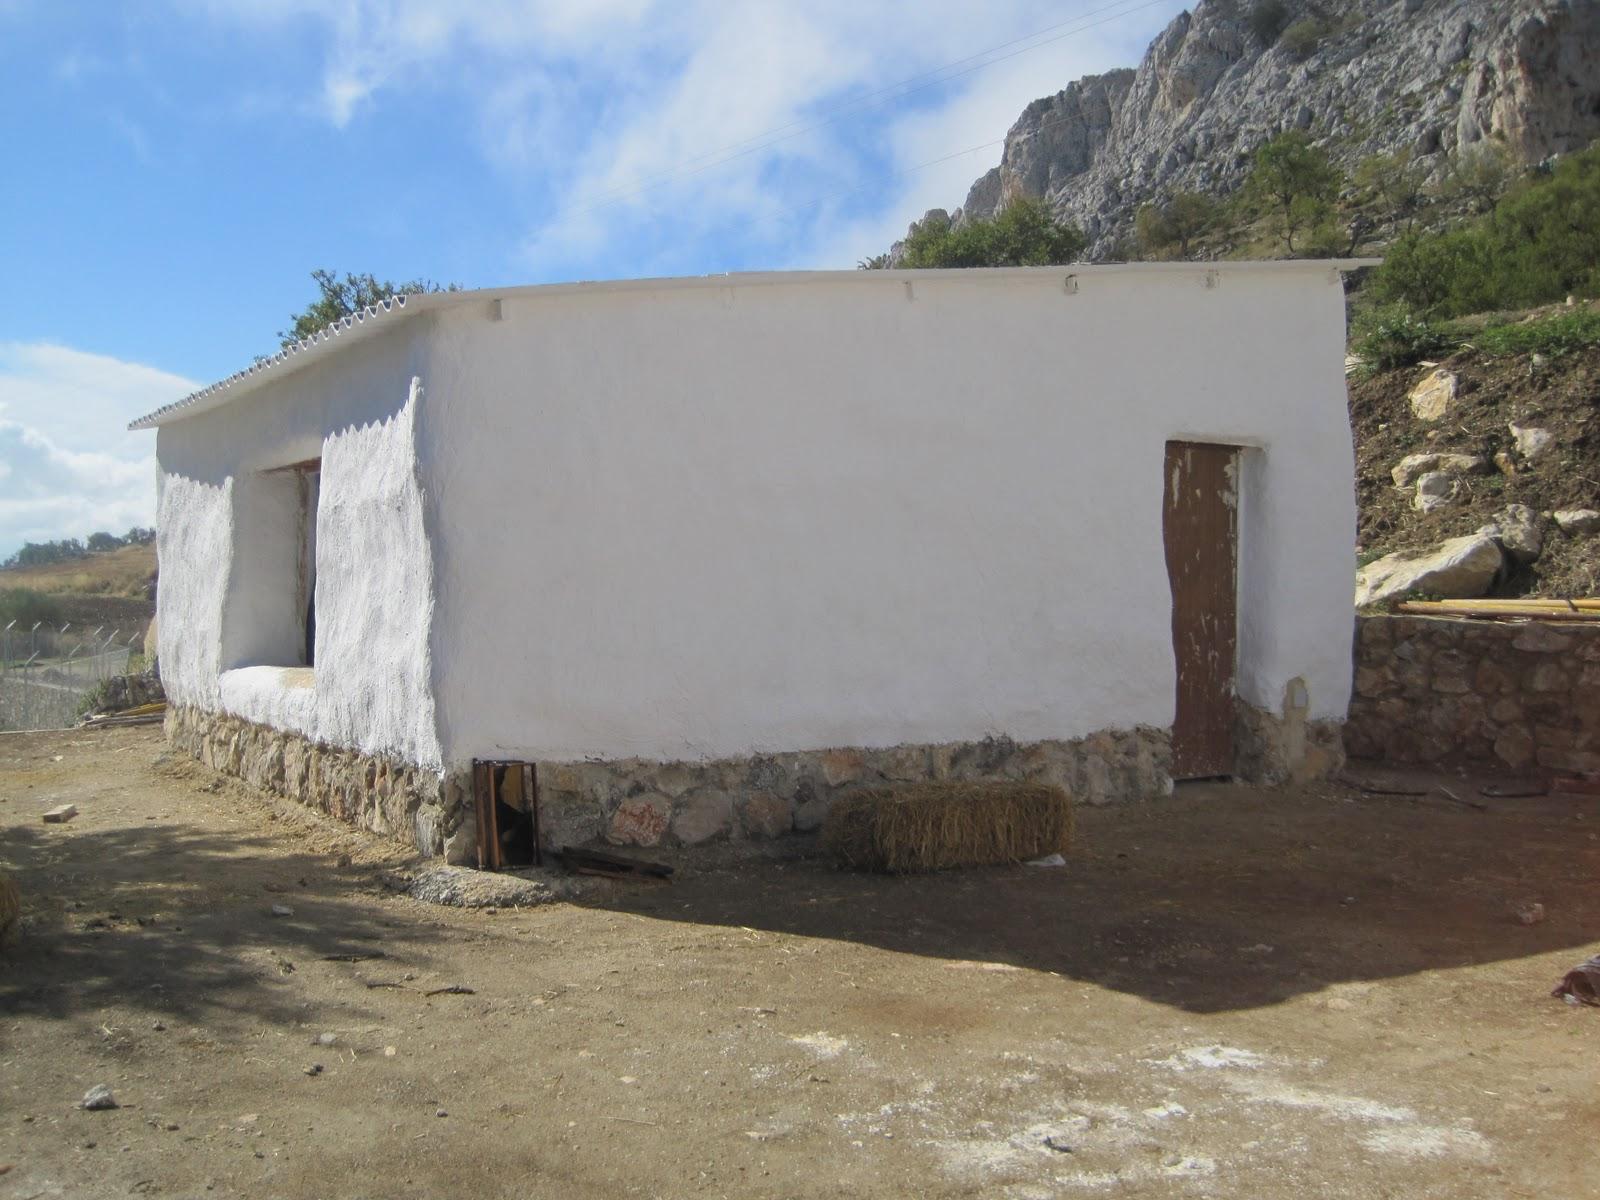 Modulo de apicultura encalado de todas las paredes - Molduras para paredes exteriores ...